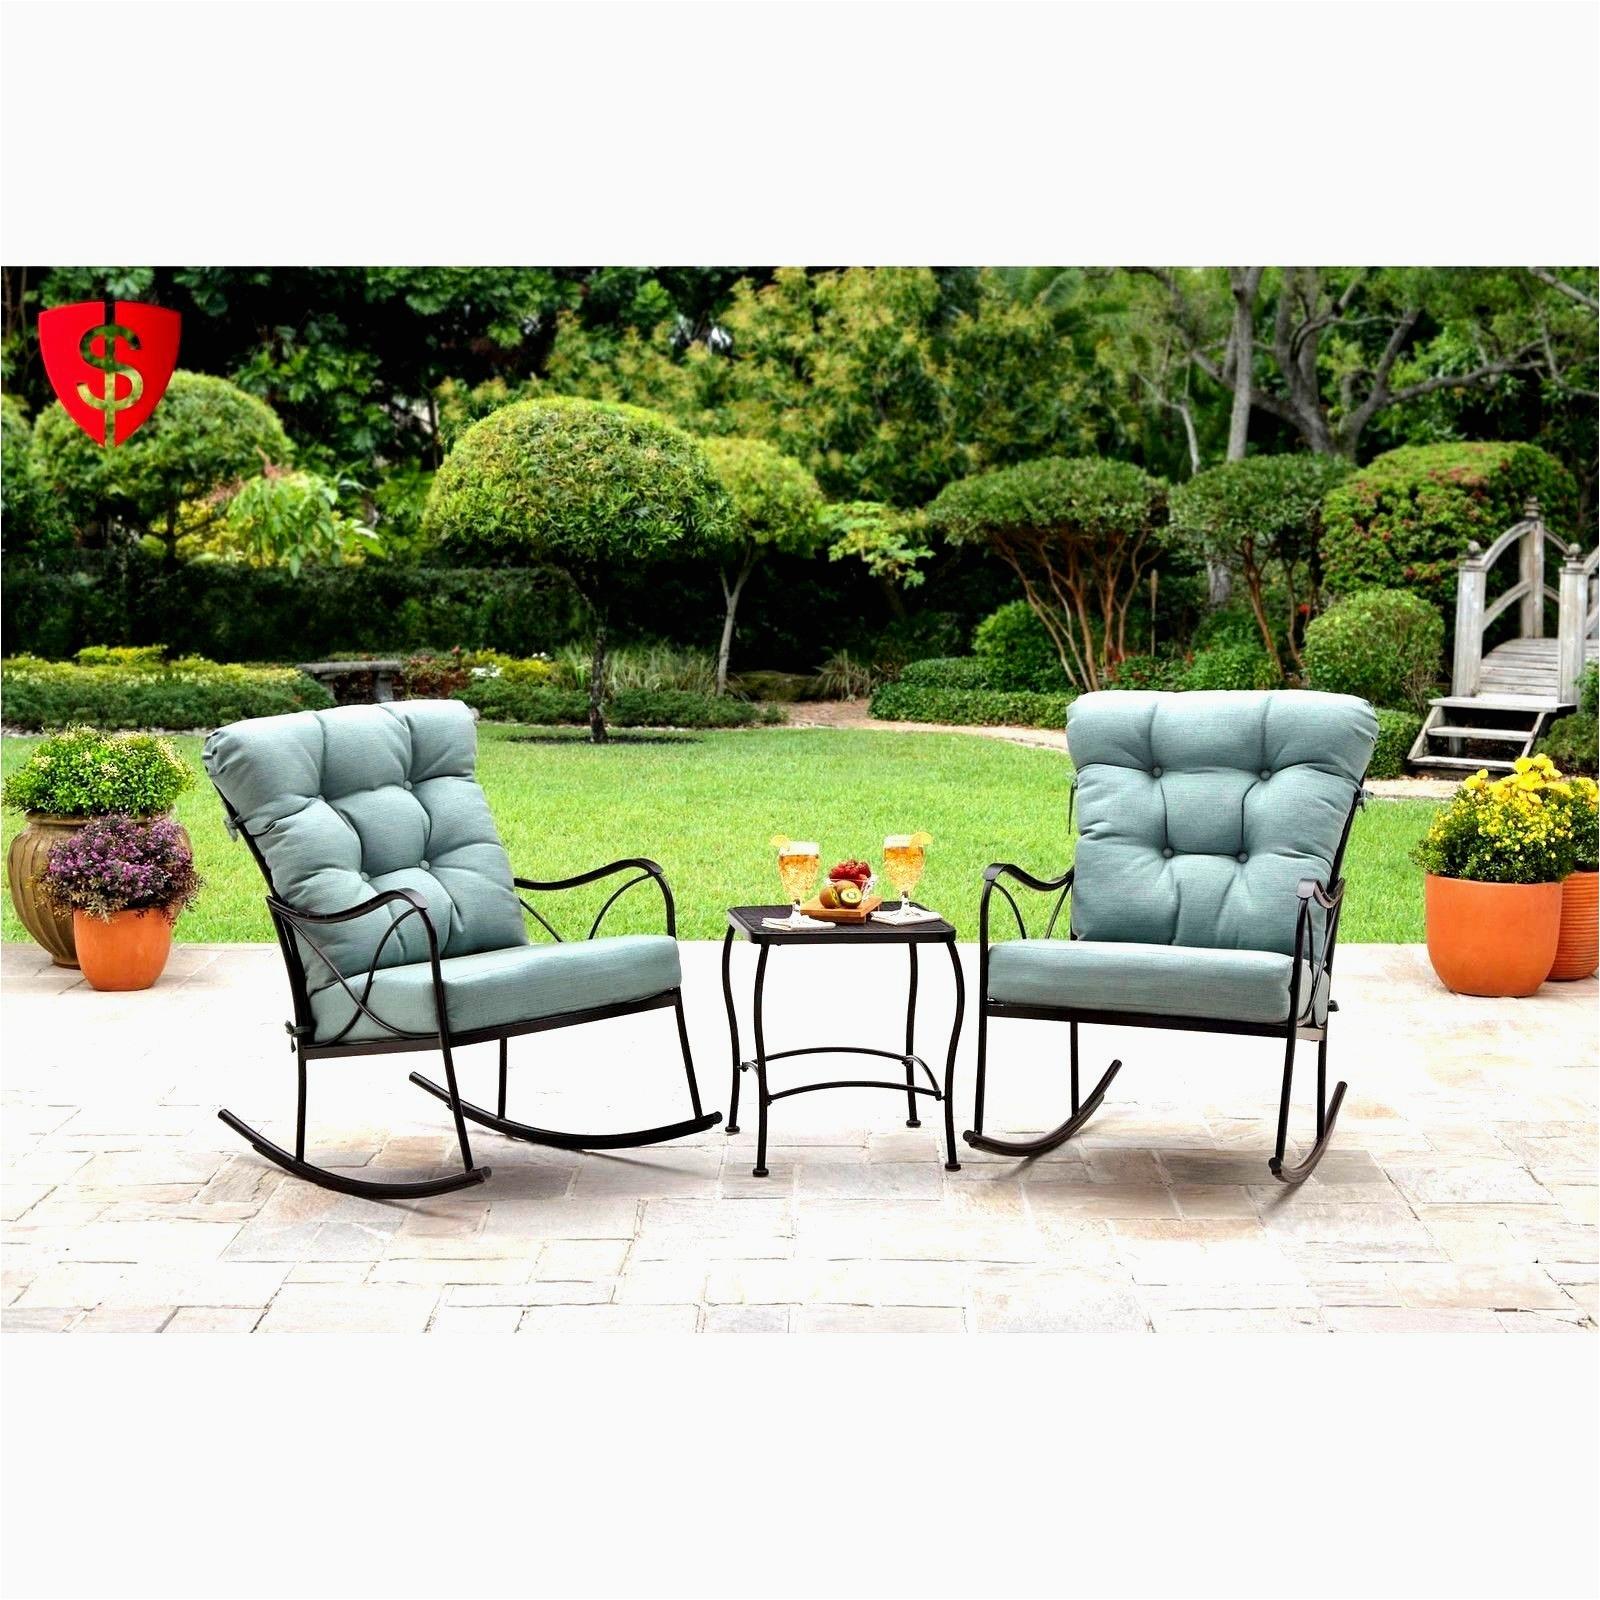 discount furniture memphis tn inspirational fresh discount patio furniture sets photograph of discount furniture memphis tn